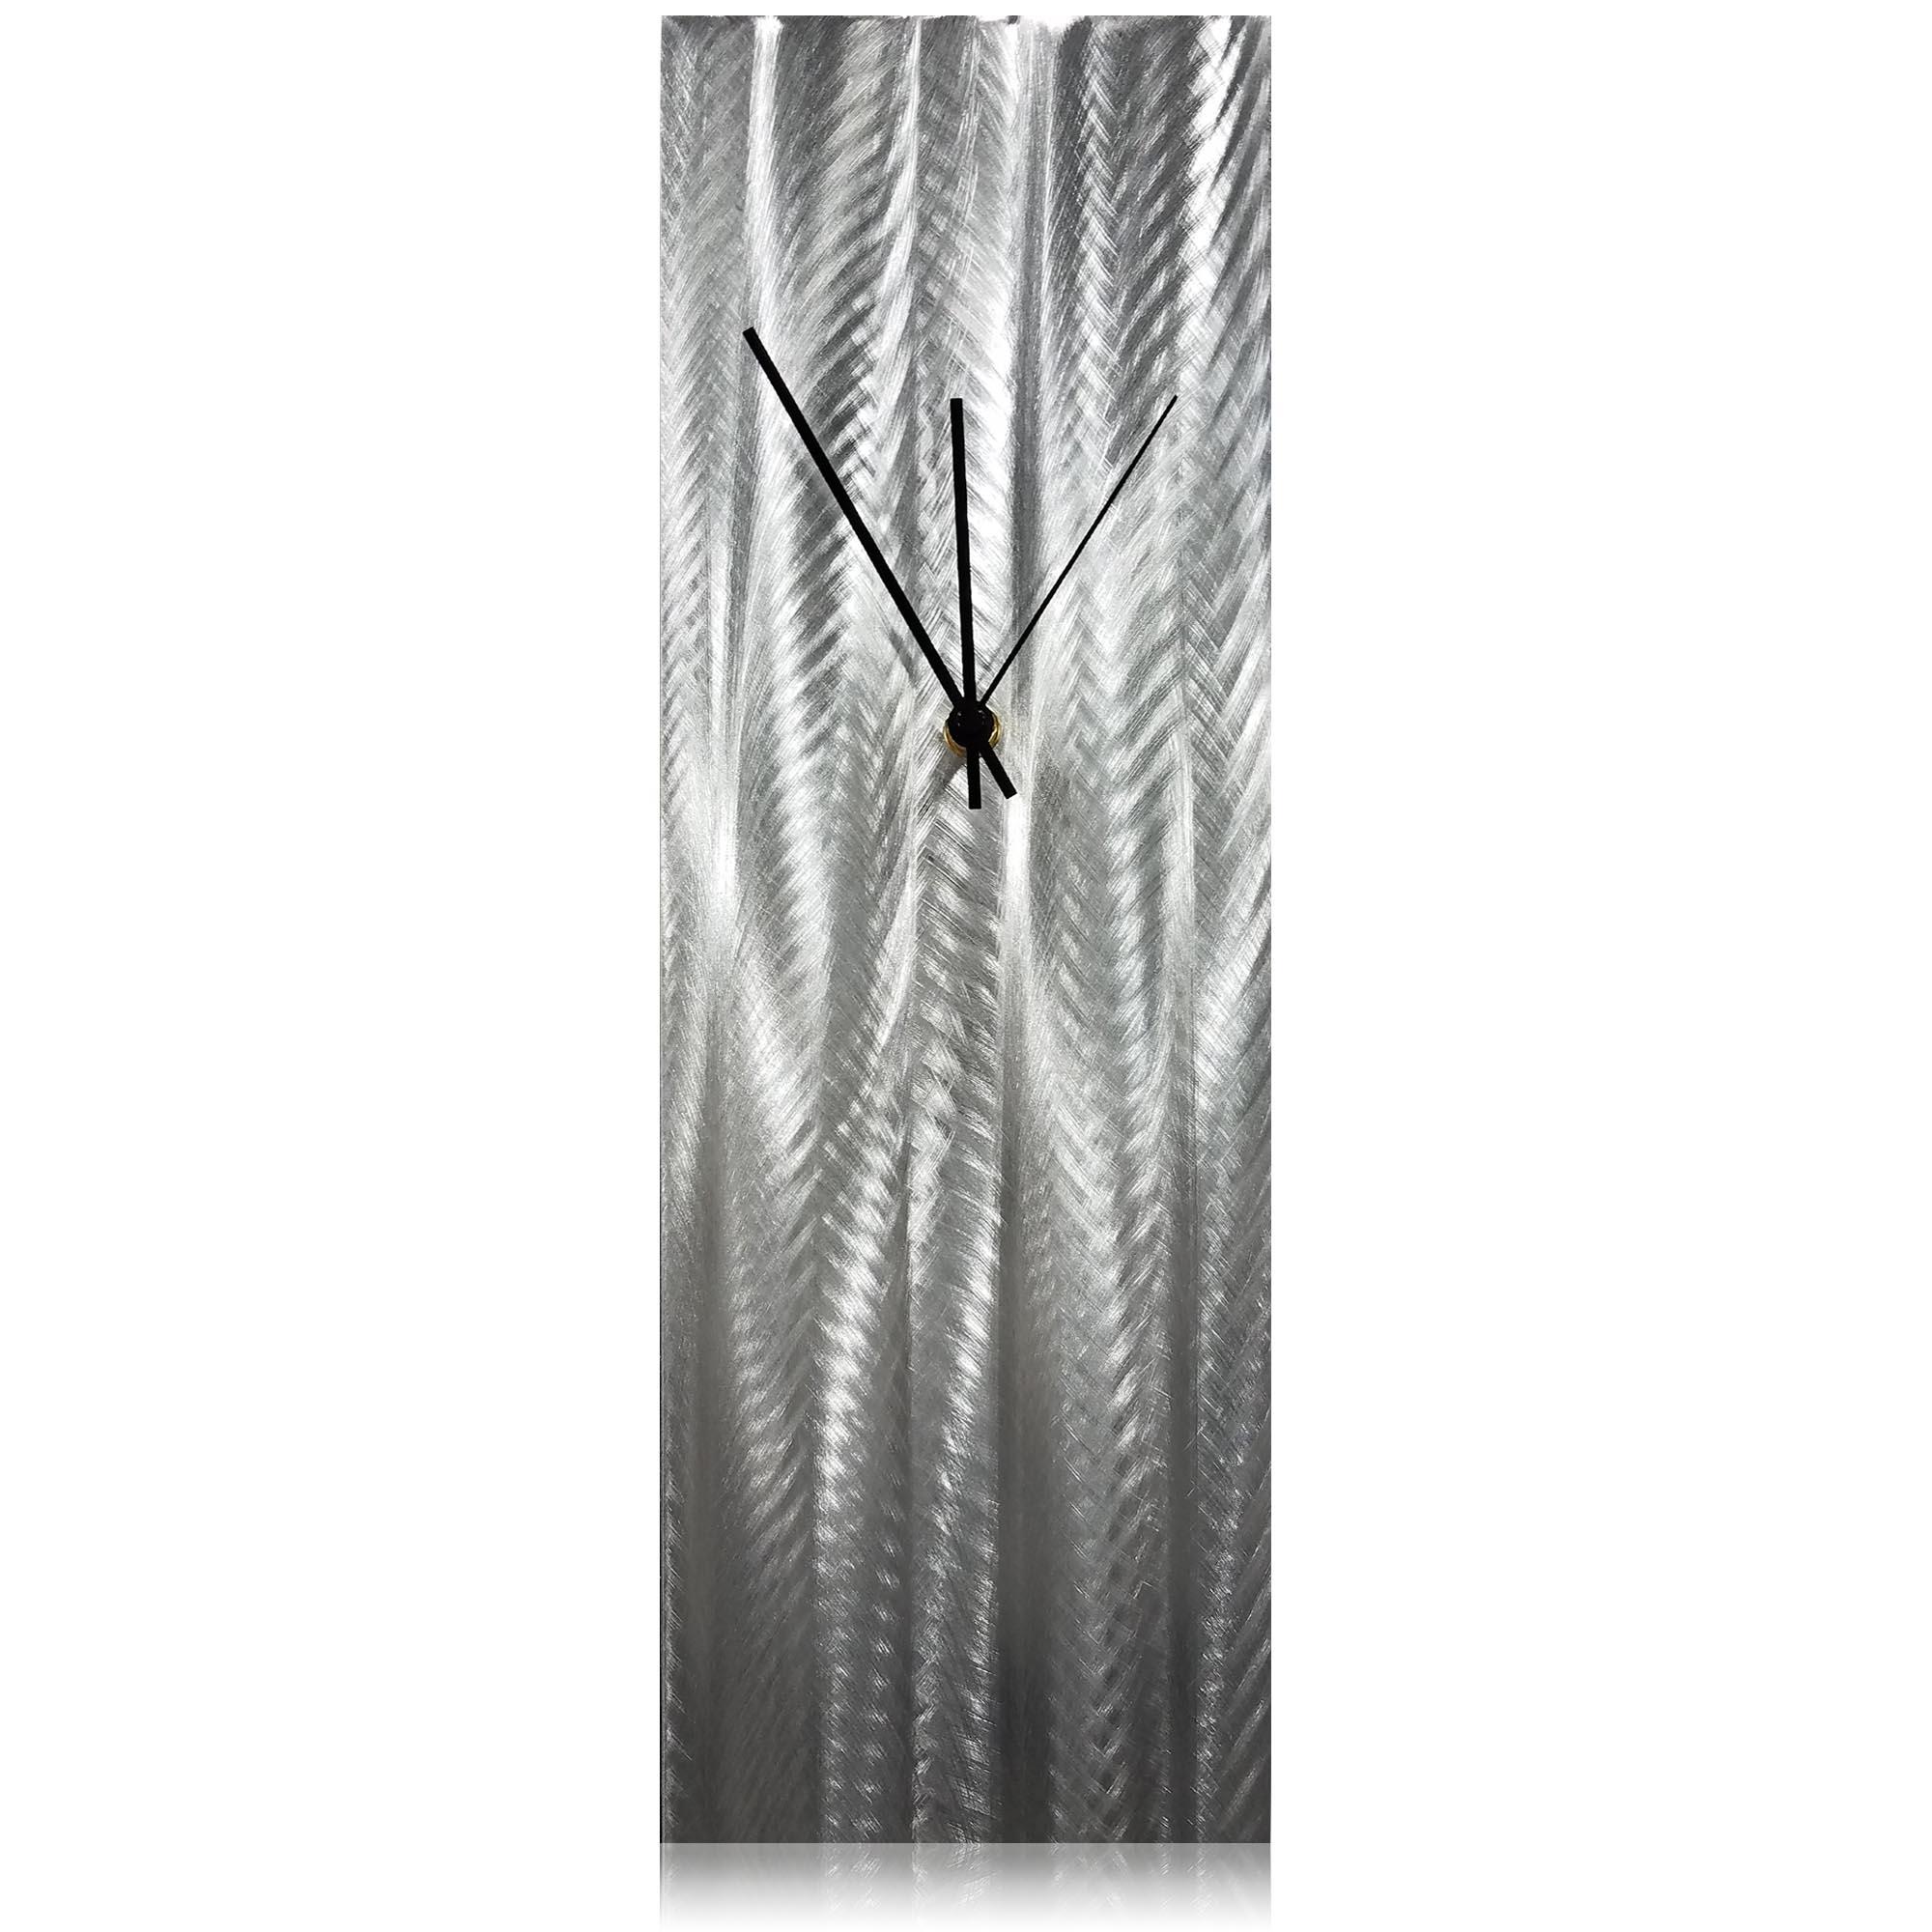 Silver Lines Desk Clock 6x18in. Natural Aluminum